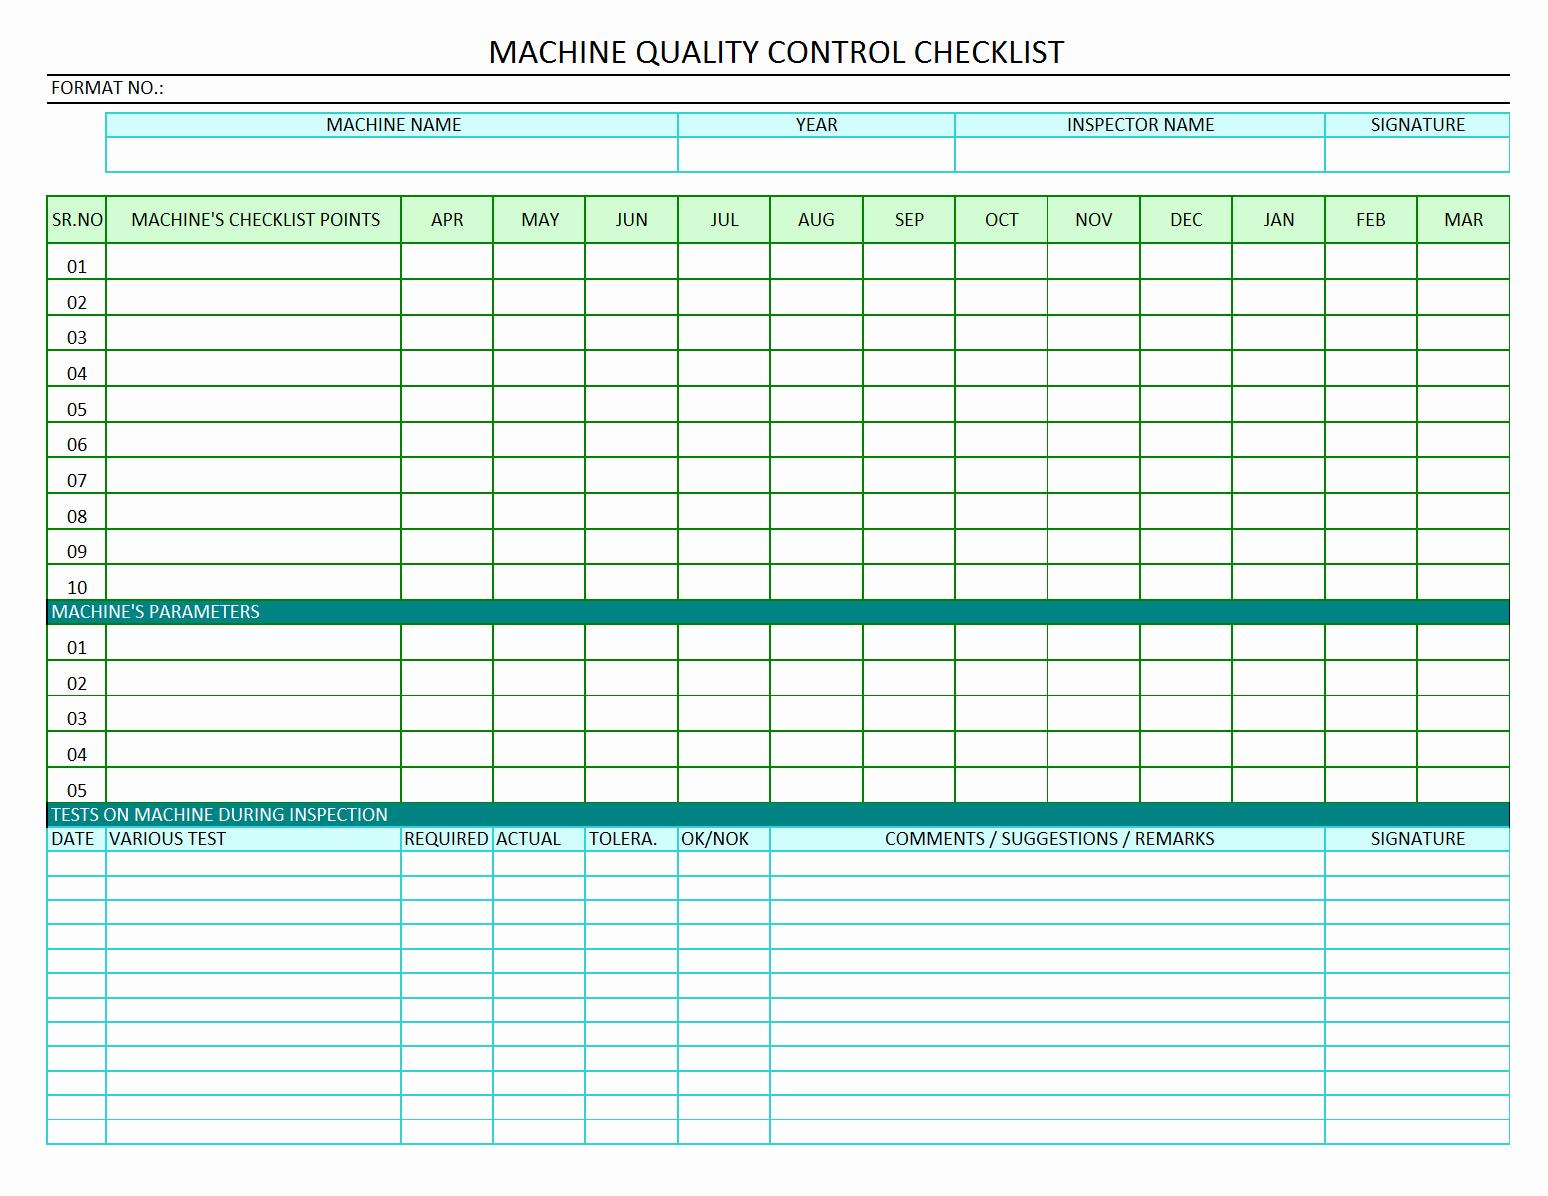 Quality Control Checklist Template New Machine Quality Control Checklist Quality Audit Of Machine